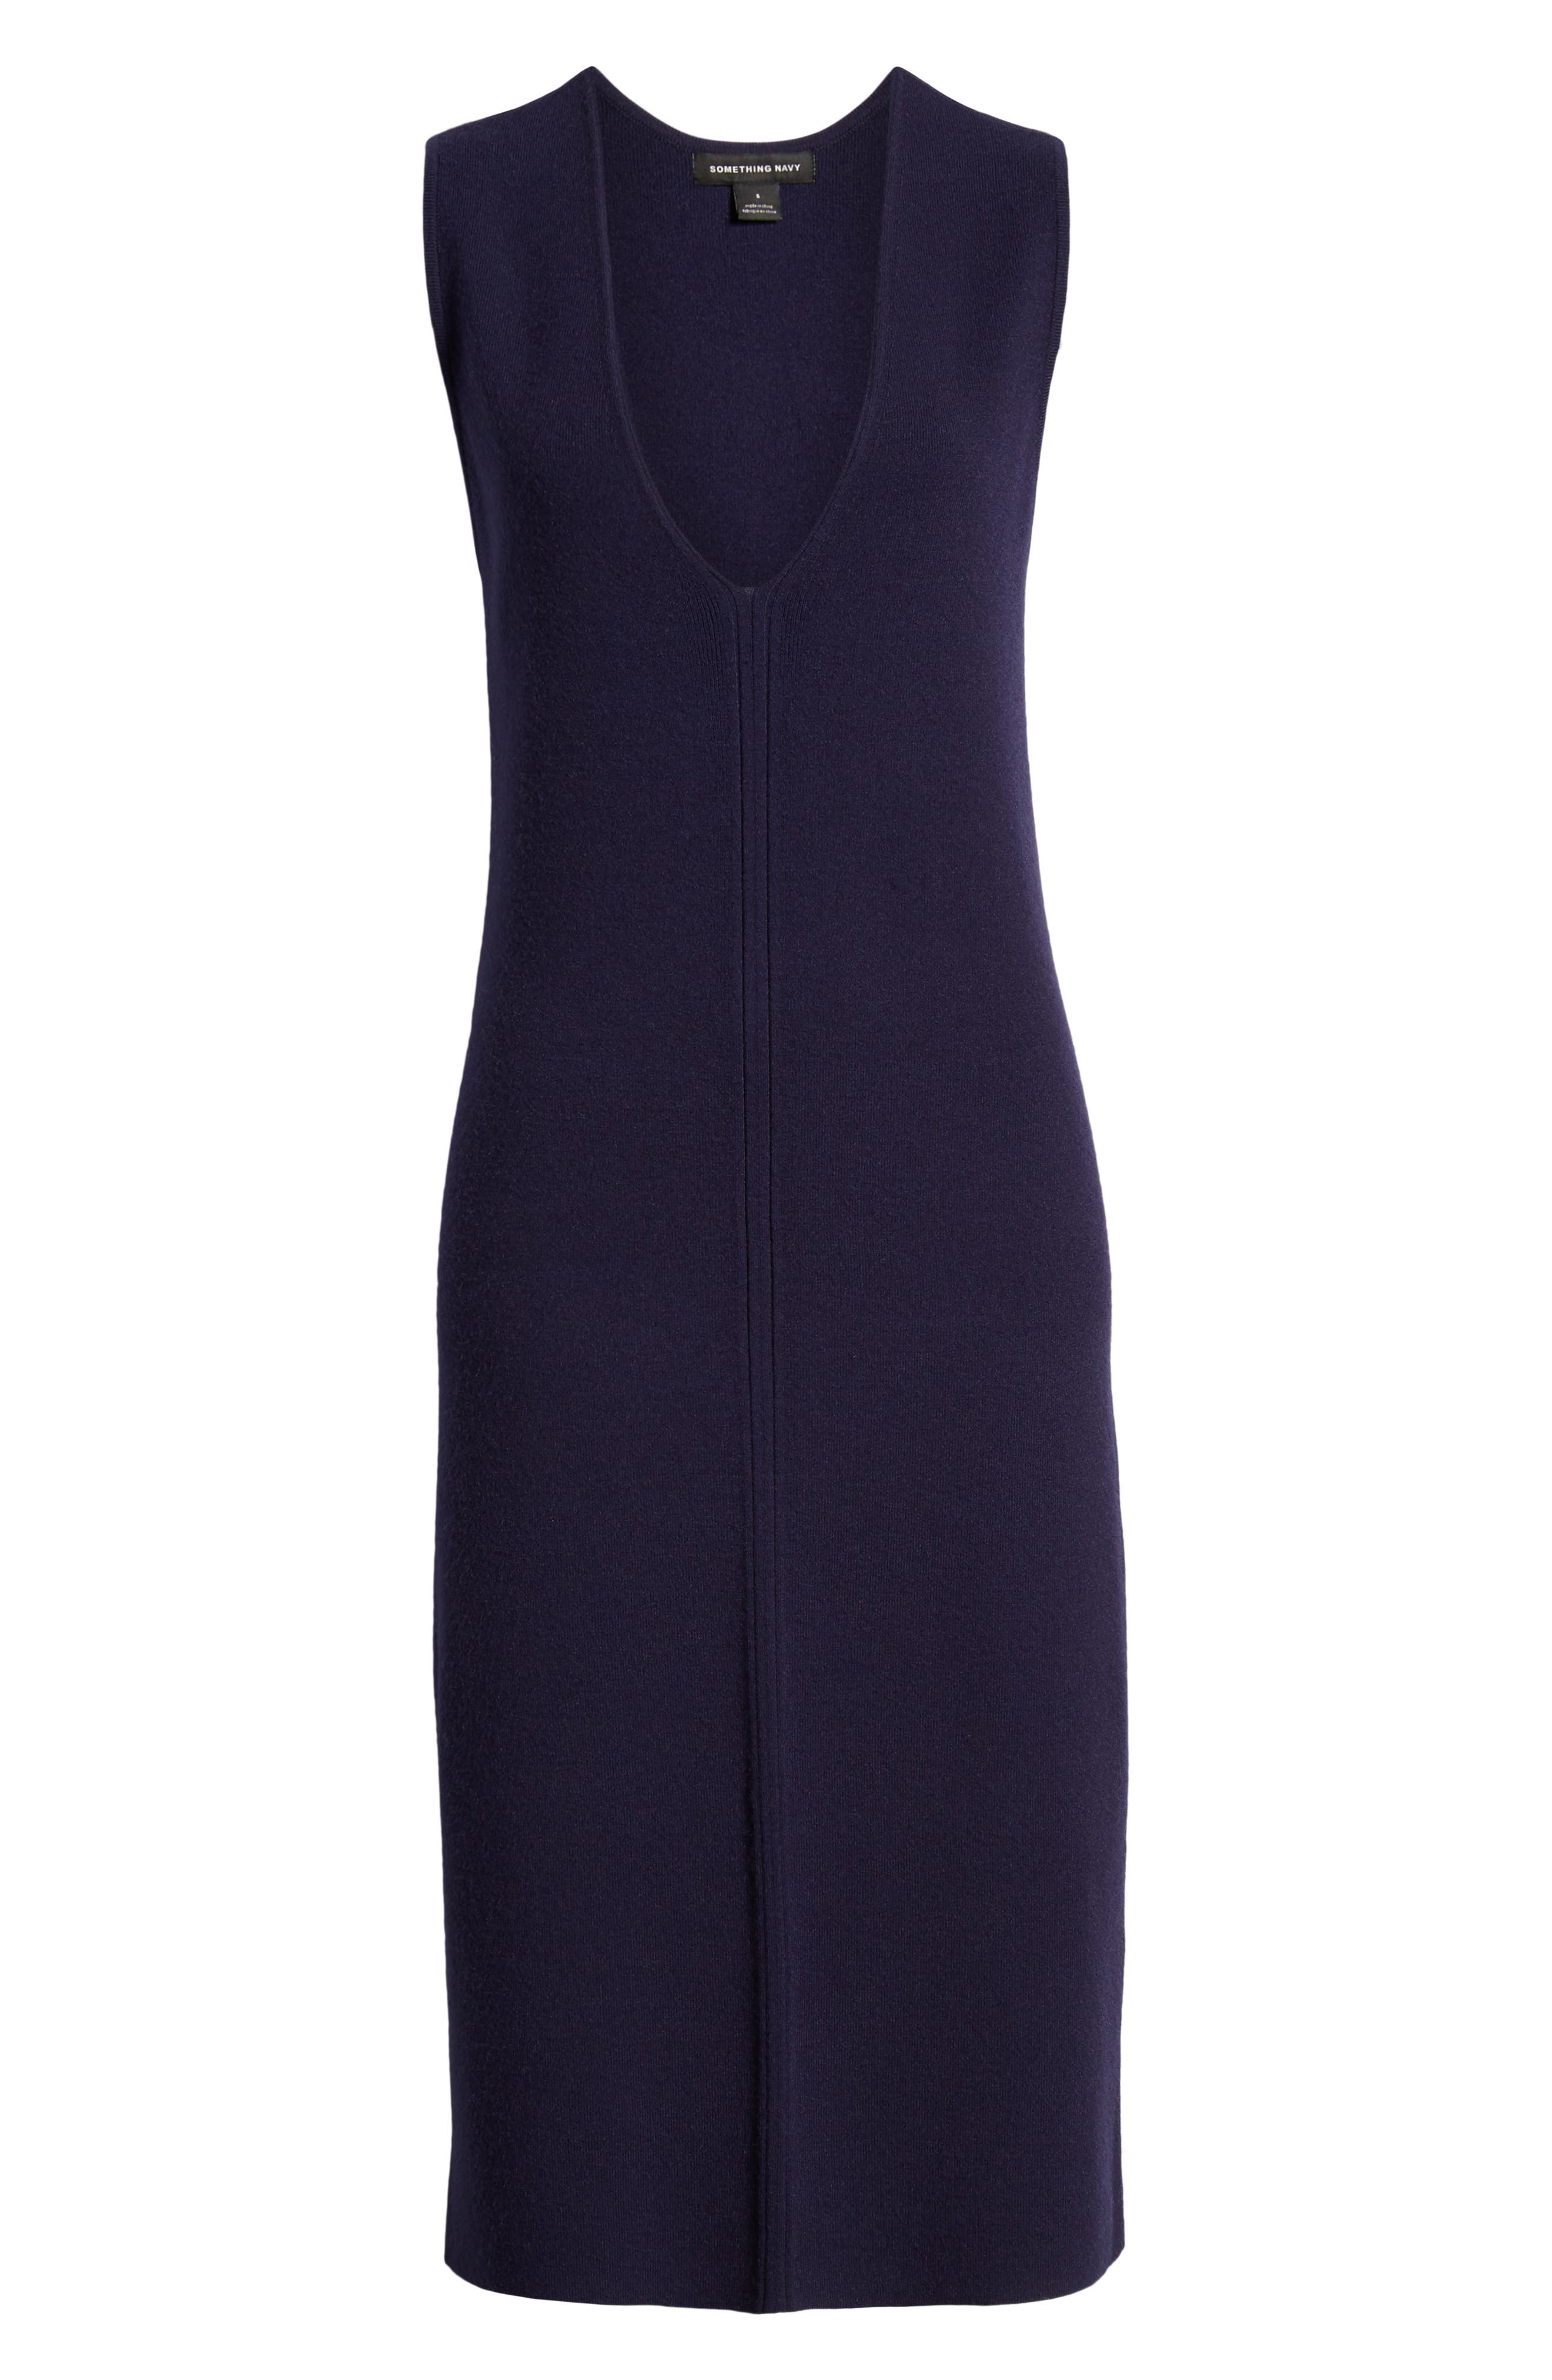 SOMETHING NAVY, Sleeveless Sweater Dress, Alternate thumbnail 7, color, 401